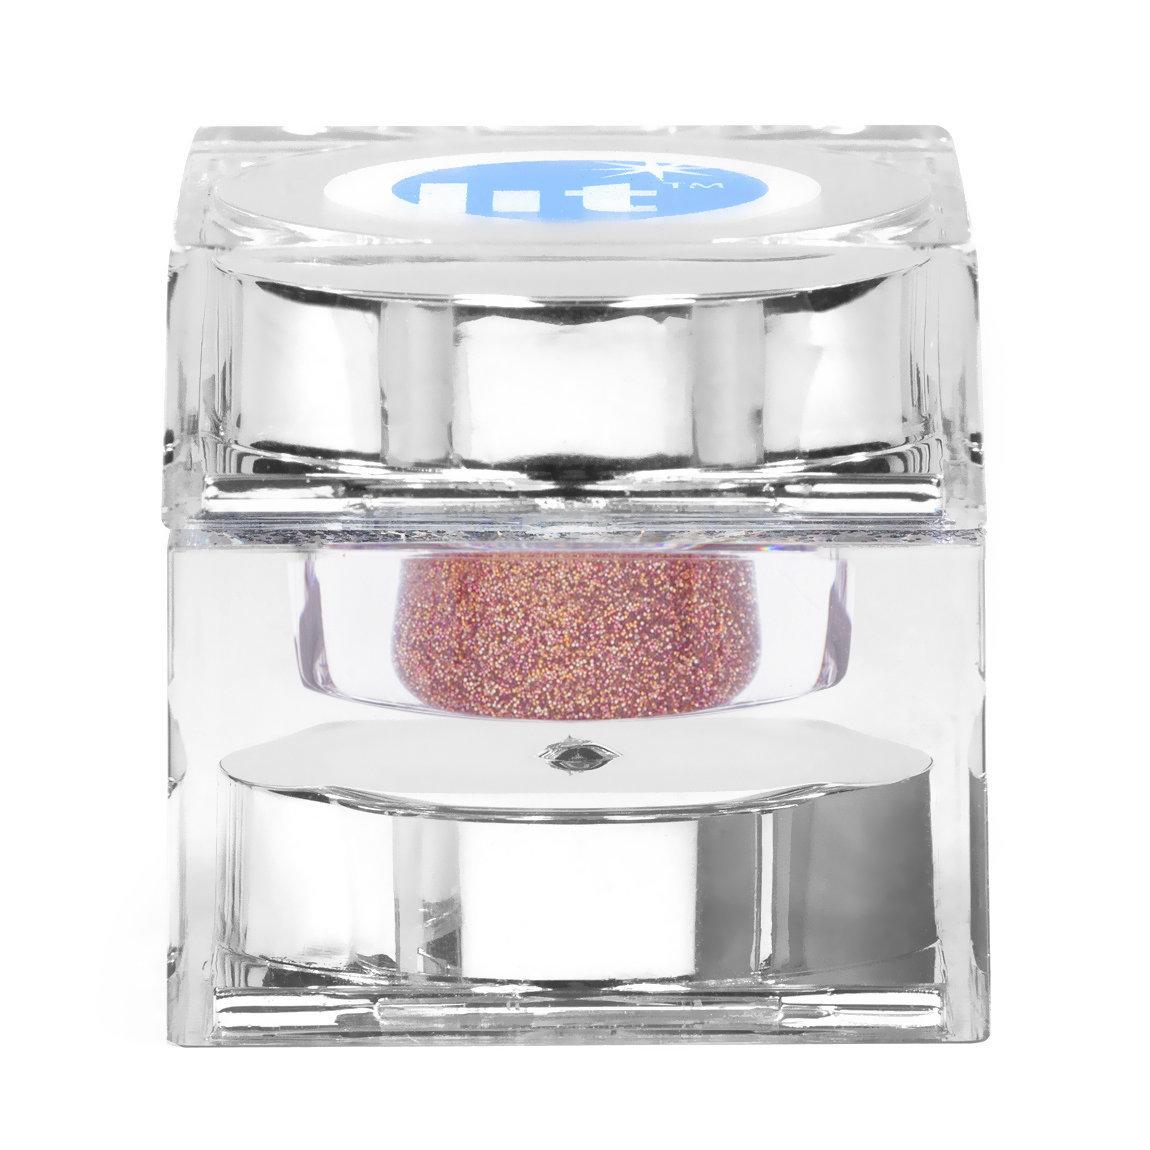 Lit Cosmetics Lit Glitter Modern Love S2 (Solid) alternative view 1.